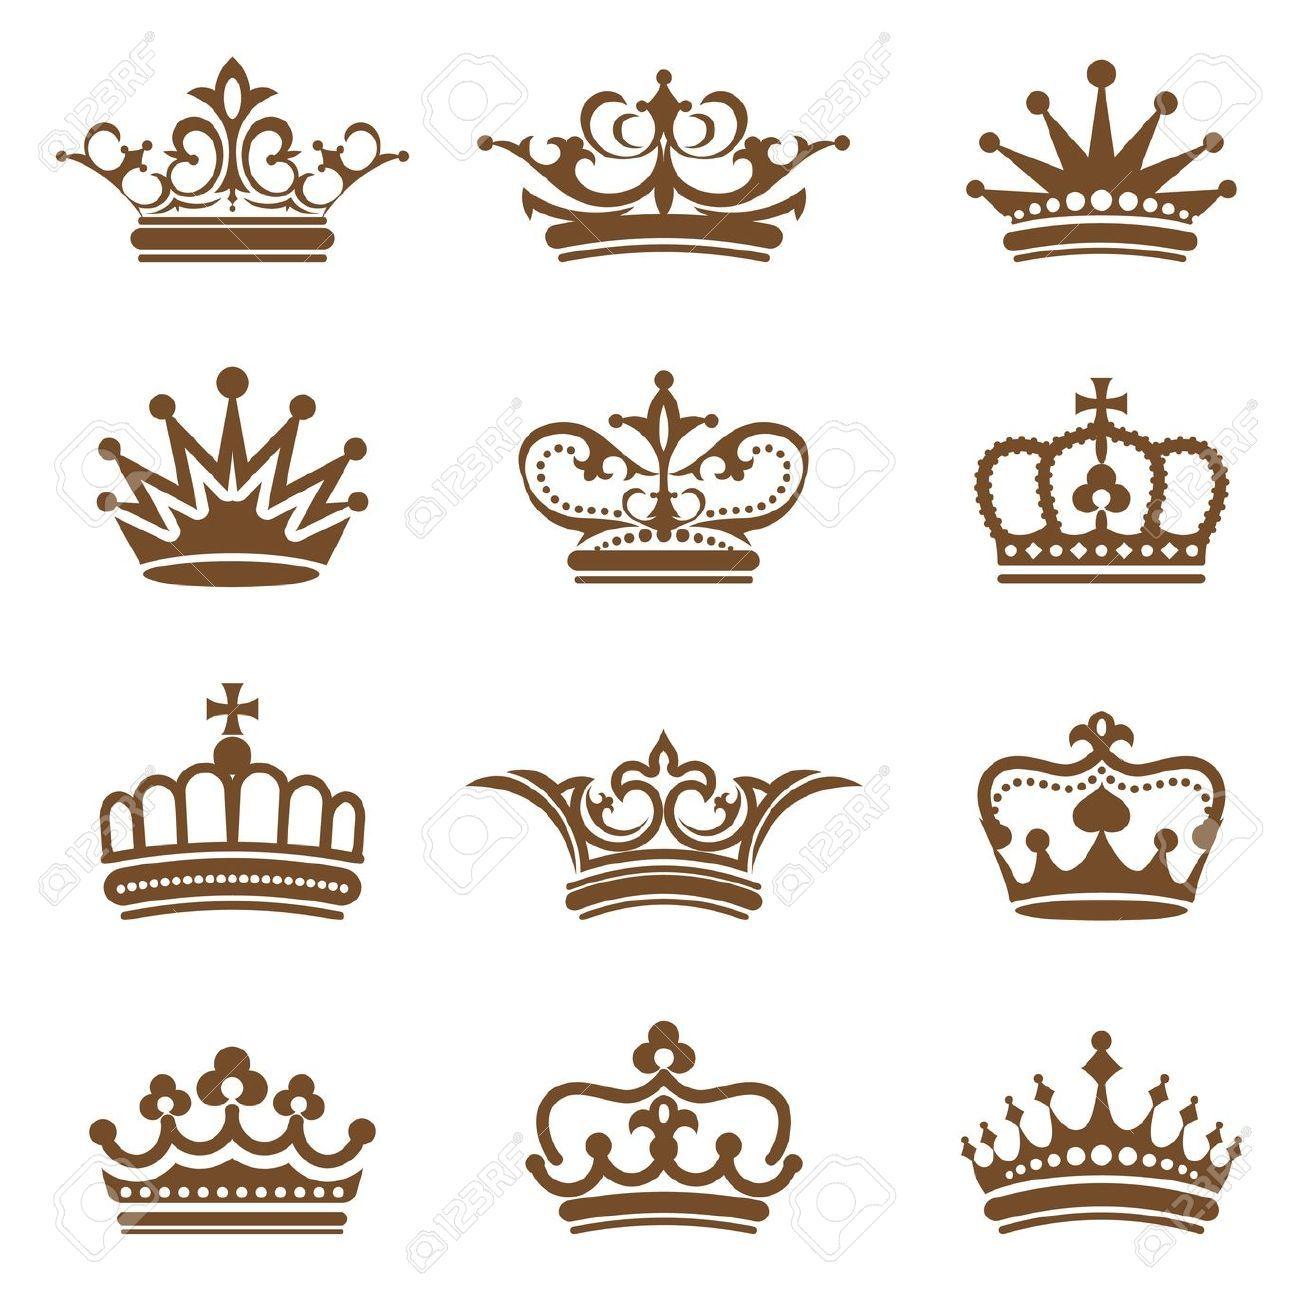 Diad me princesse dessin recherche google crowns - Dessin princesse ...